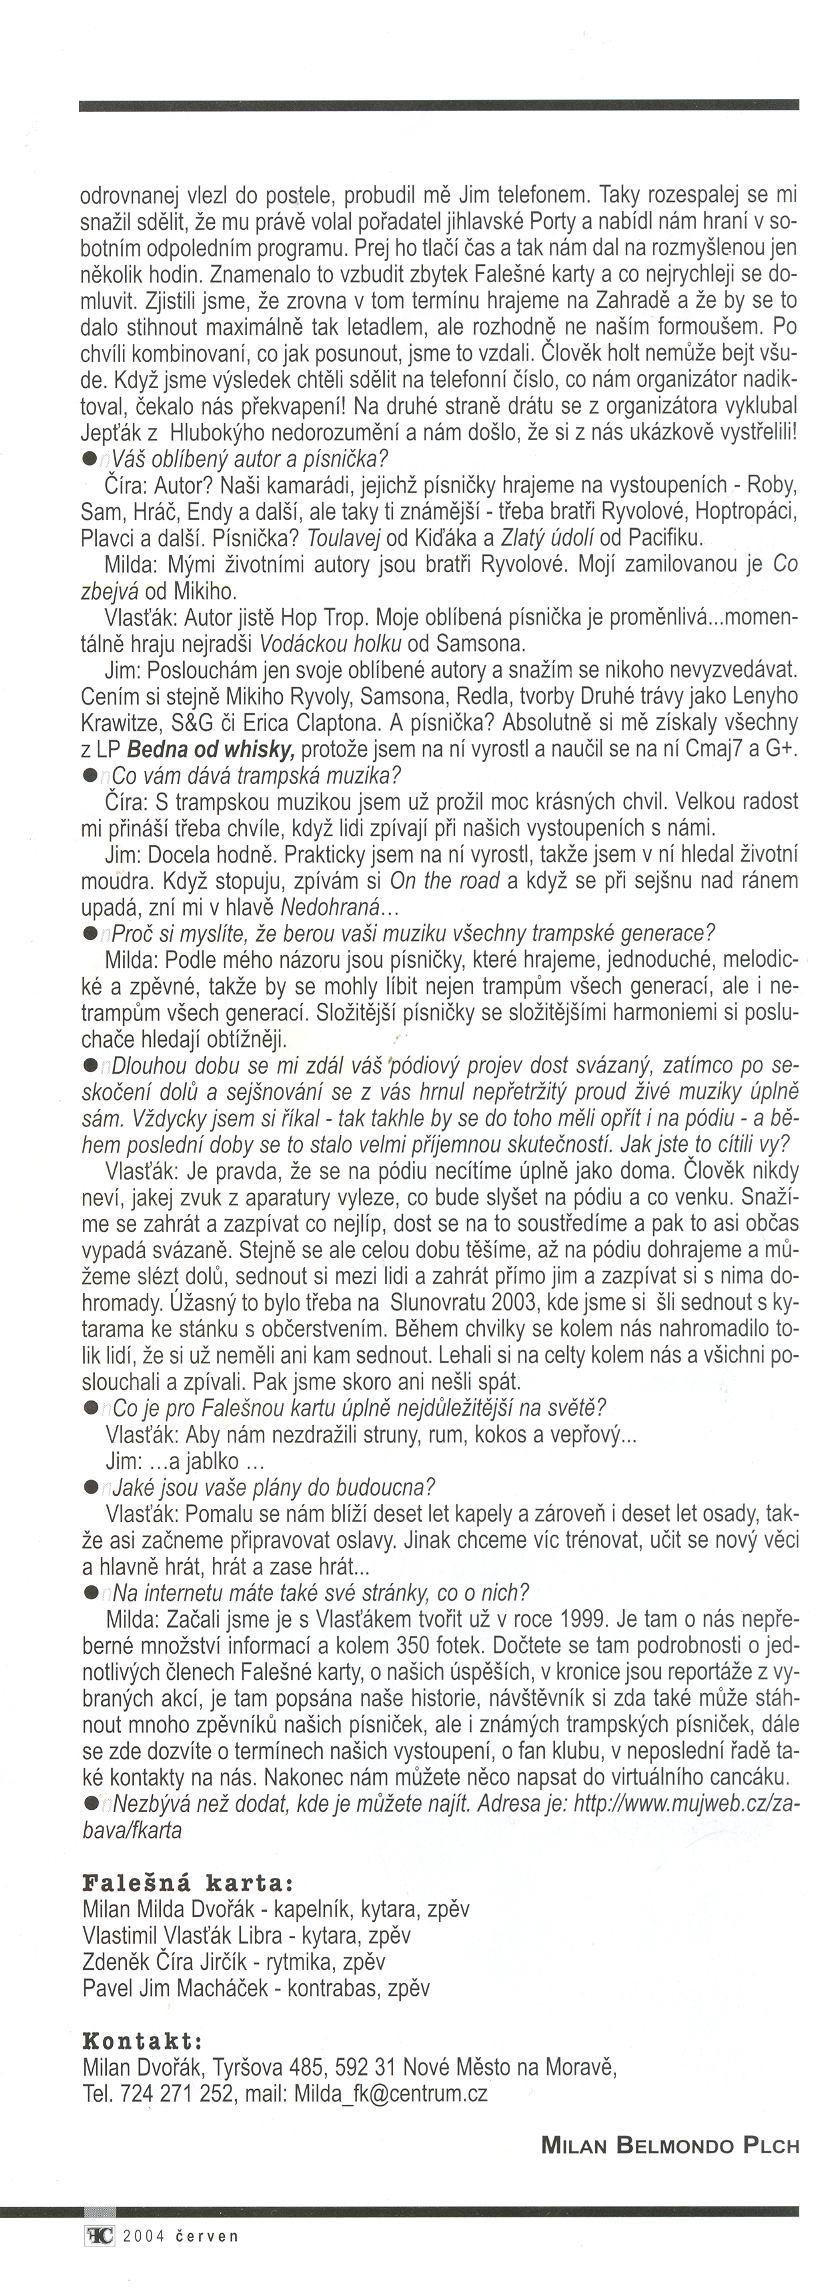 Folk & Country - Rozhovor s FK, 2. strana